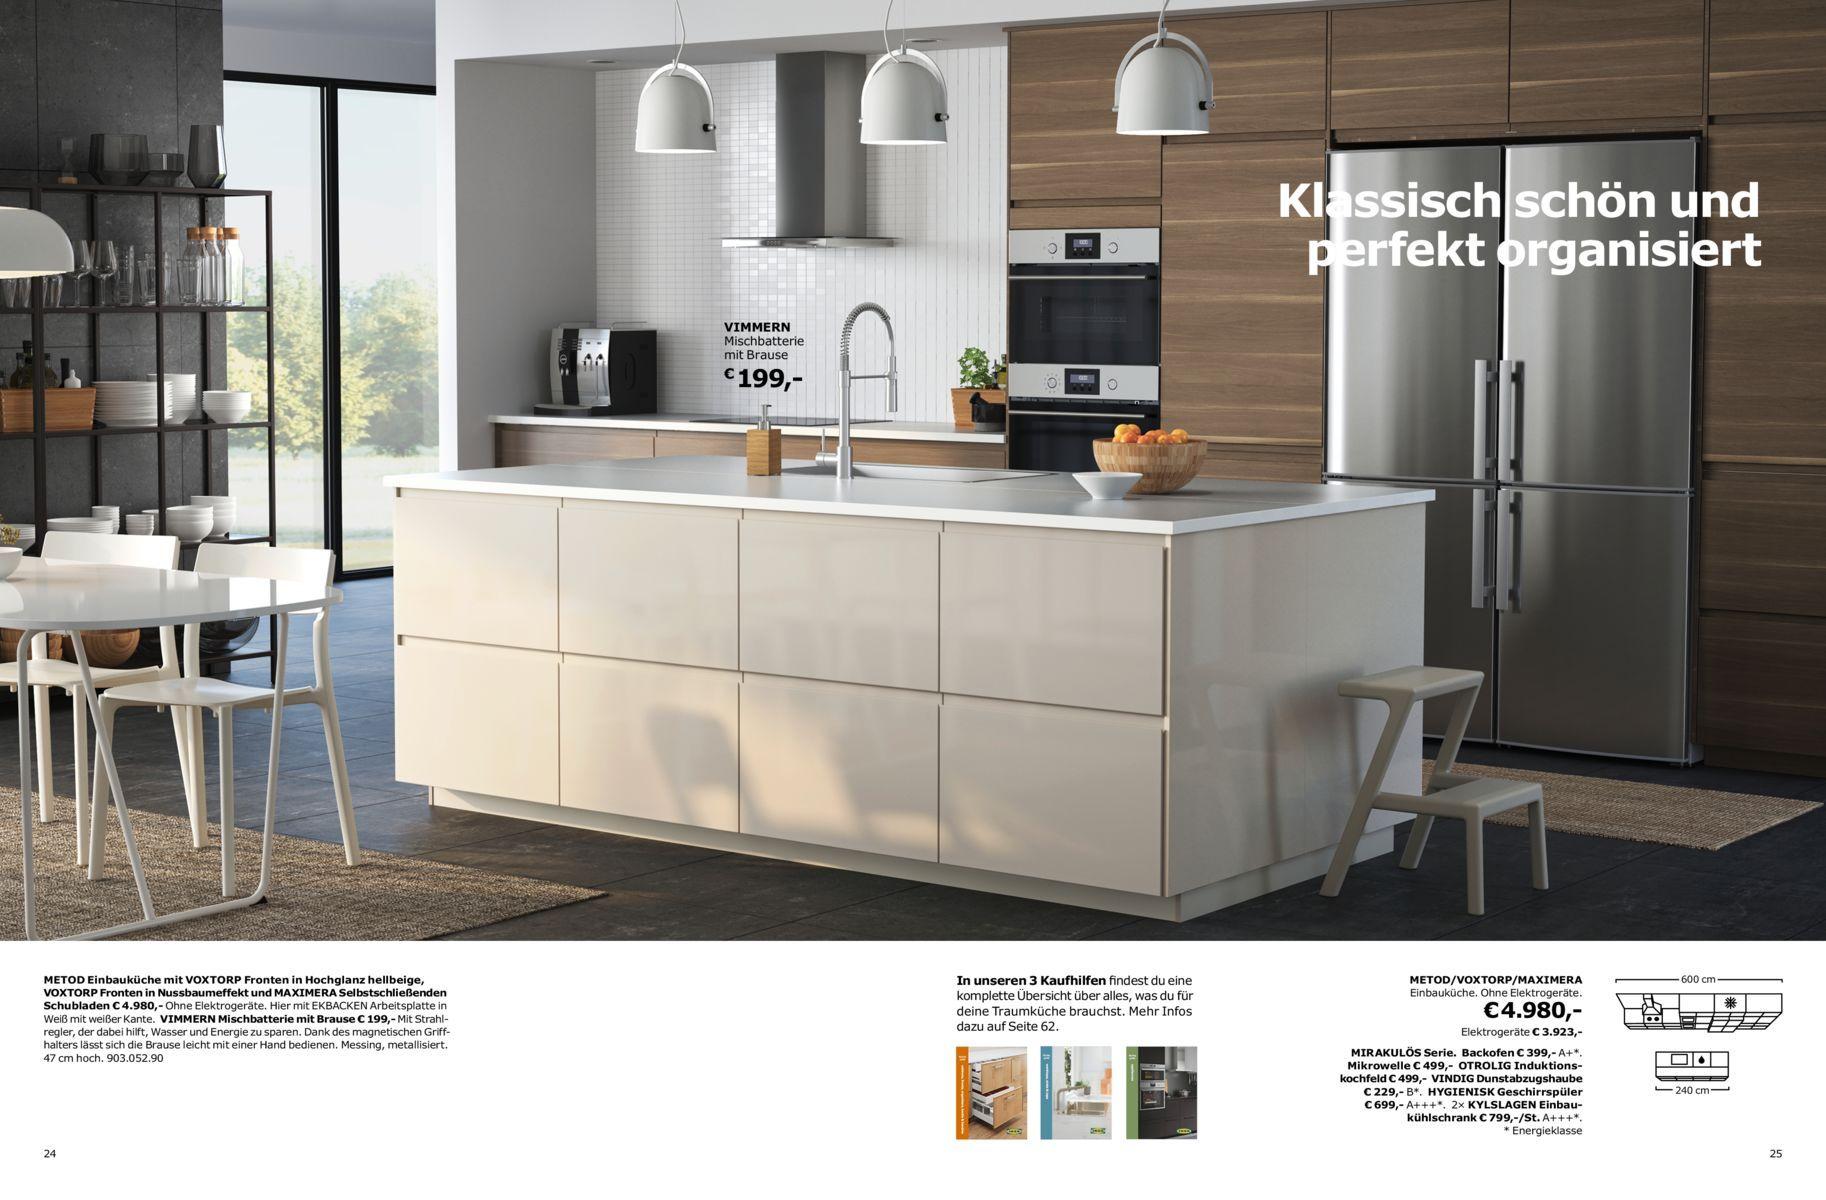 Ikea Kuchenbroschure 2018 Kuchenschrank Ikea Arbeitsplatte Kuche Arbeitsplatte